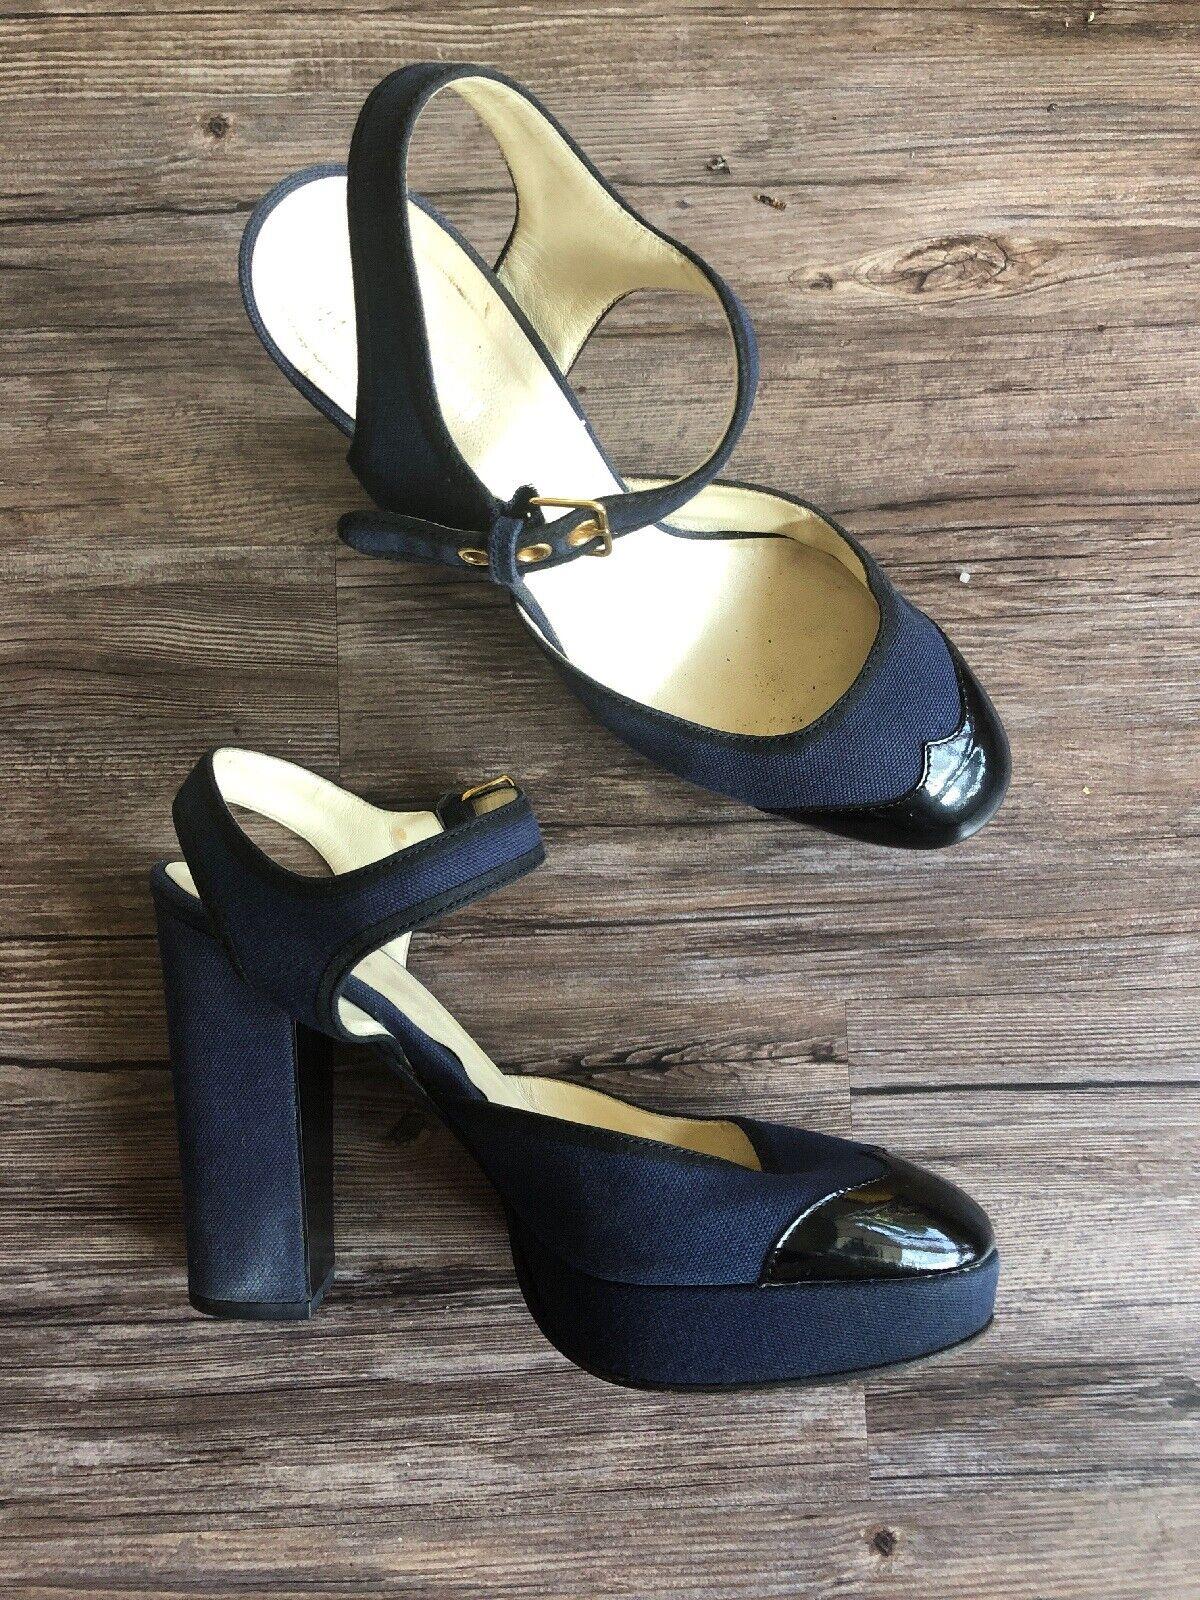 Miu Miu donna Top Strap Block Heel  Platform Pump blu Dimensione 40 nero Toe Round  centro commerciale di moda